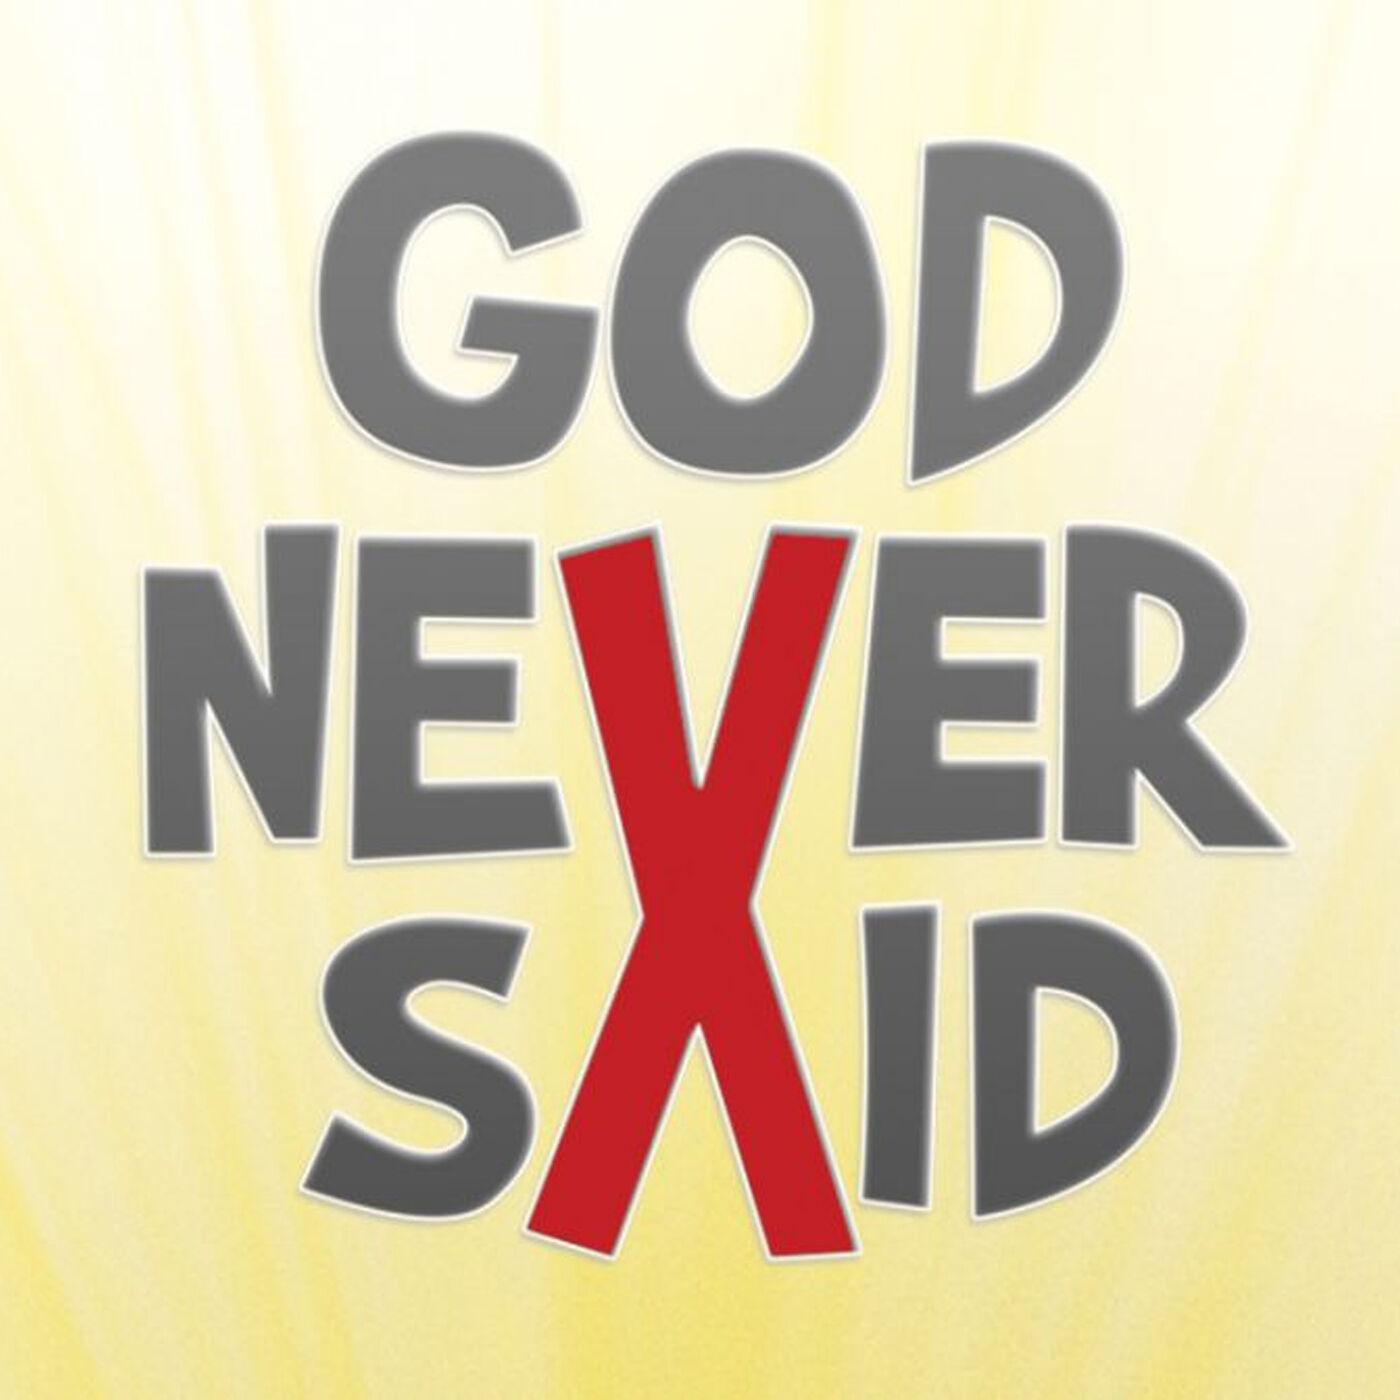 God Never Said: Don't Judge